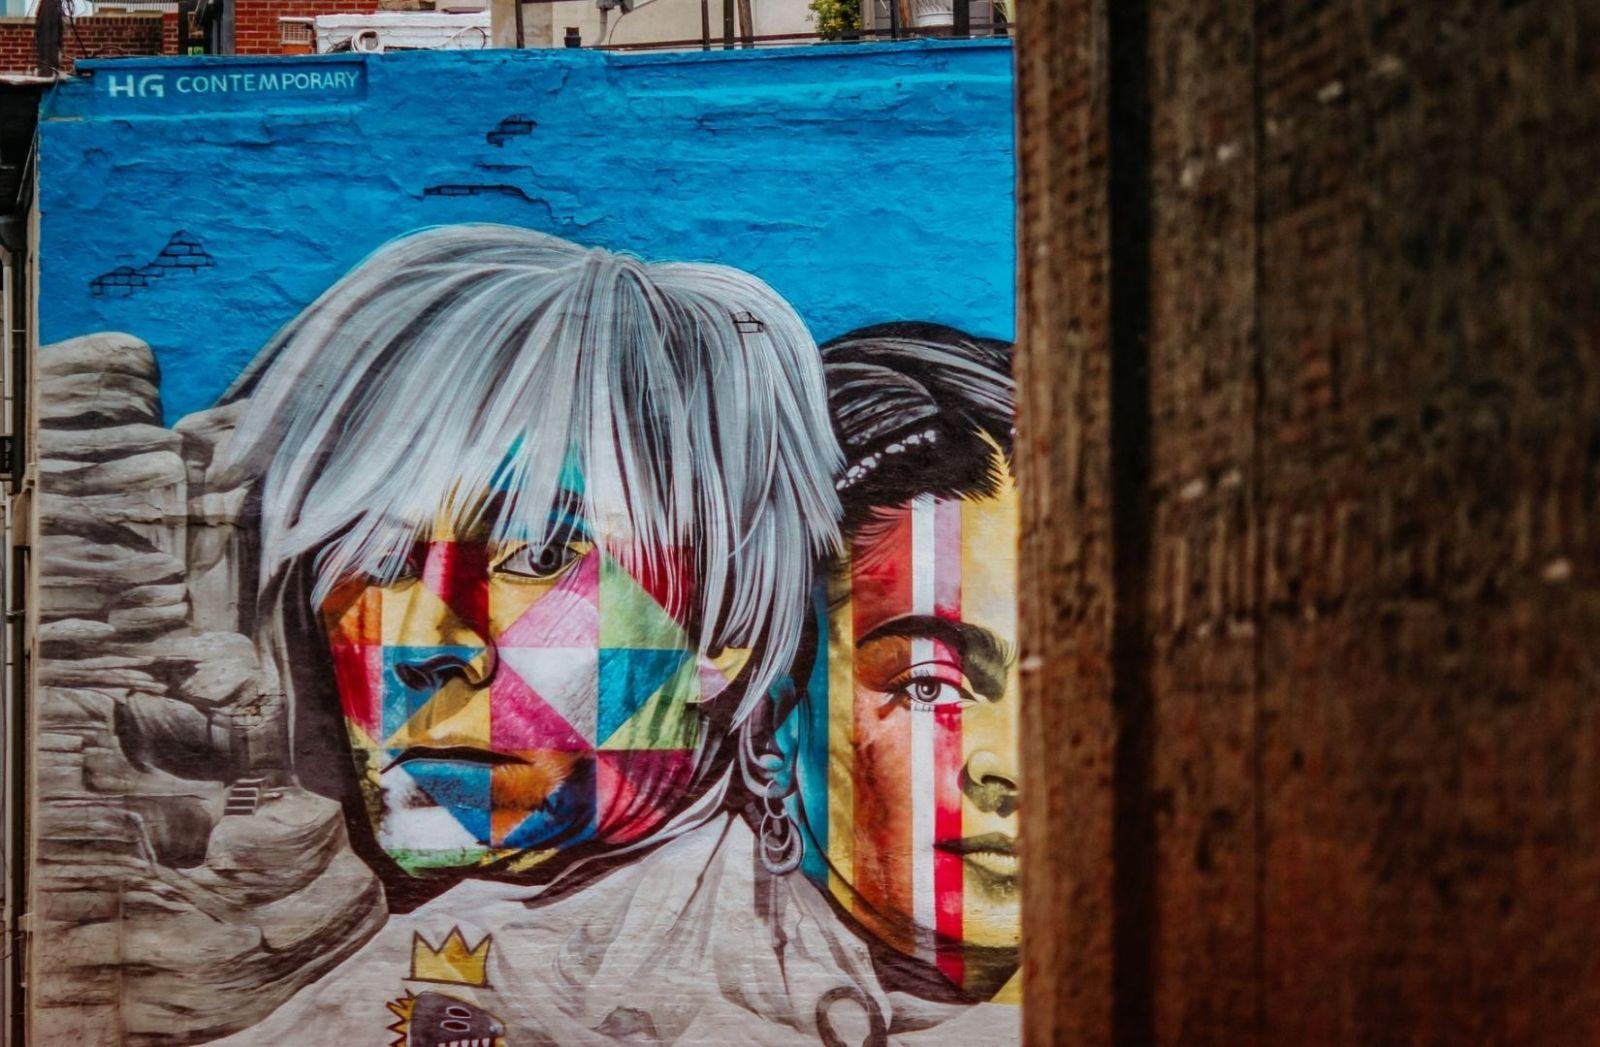 Produktionsfaktor Kunst als Street Art. (Foto: Jon Tyson, Unsplash.com)